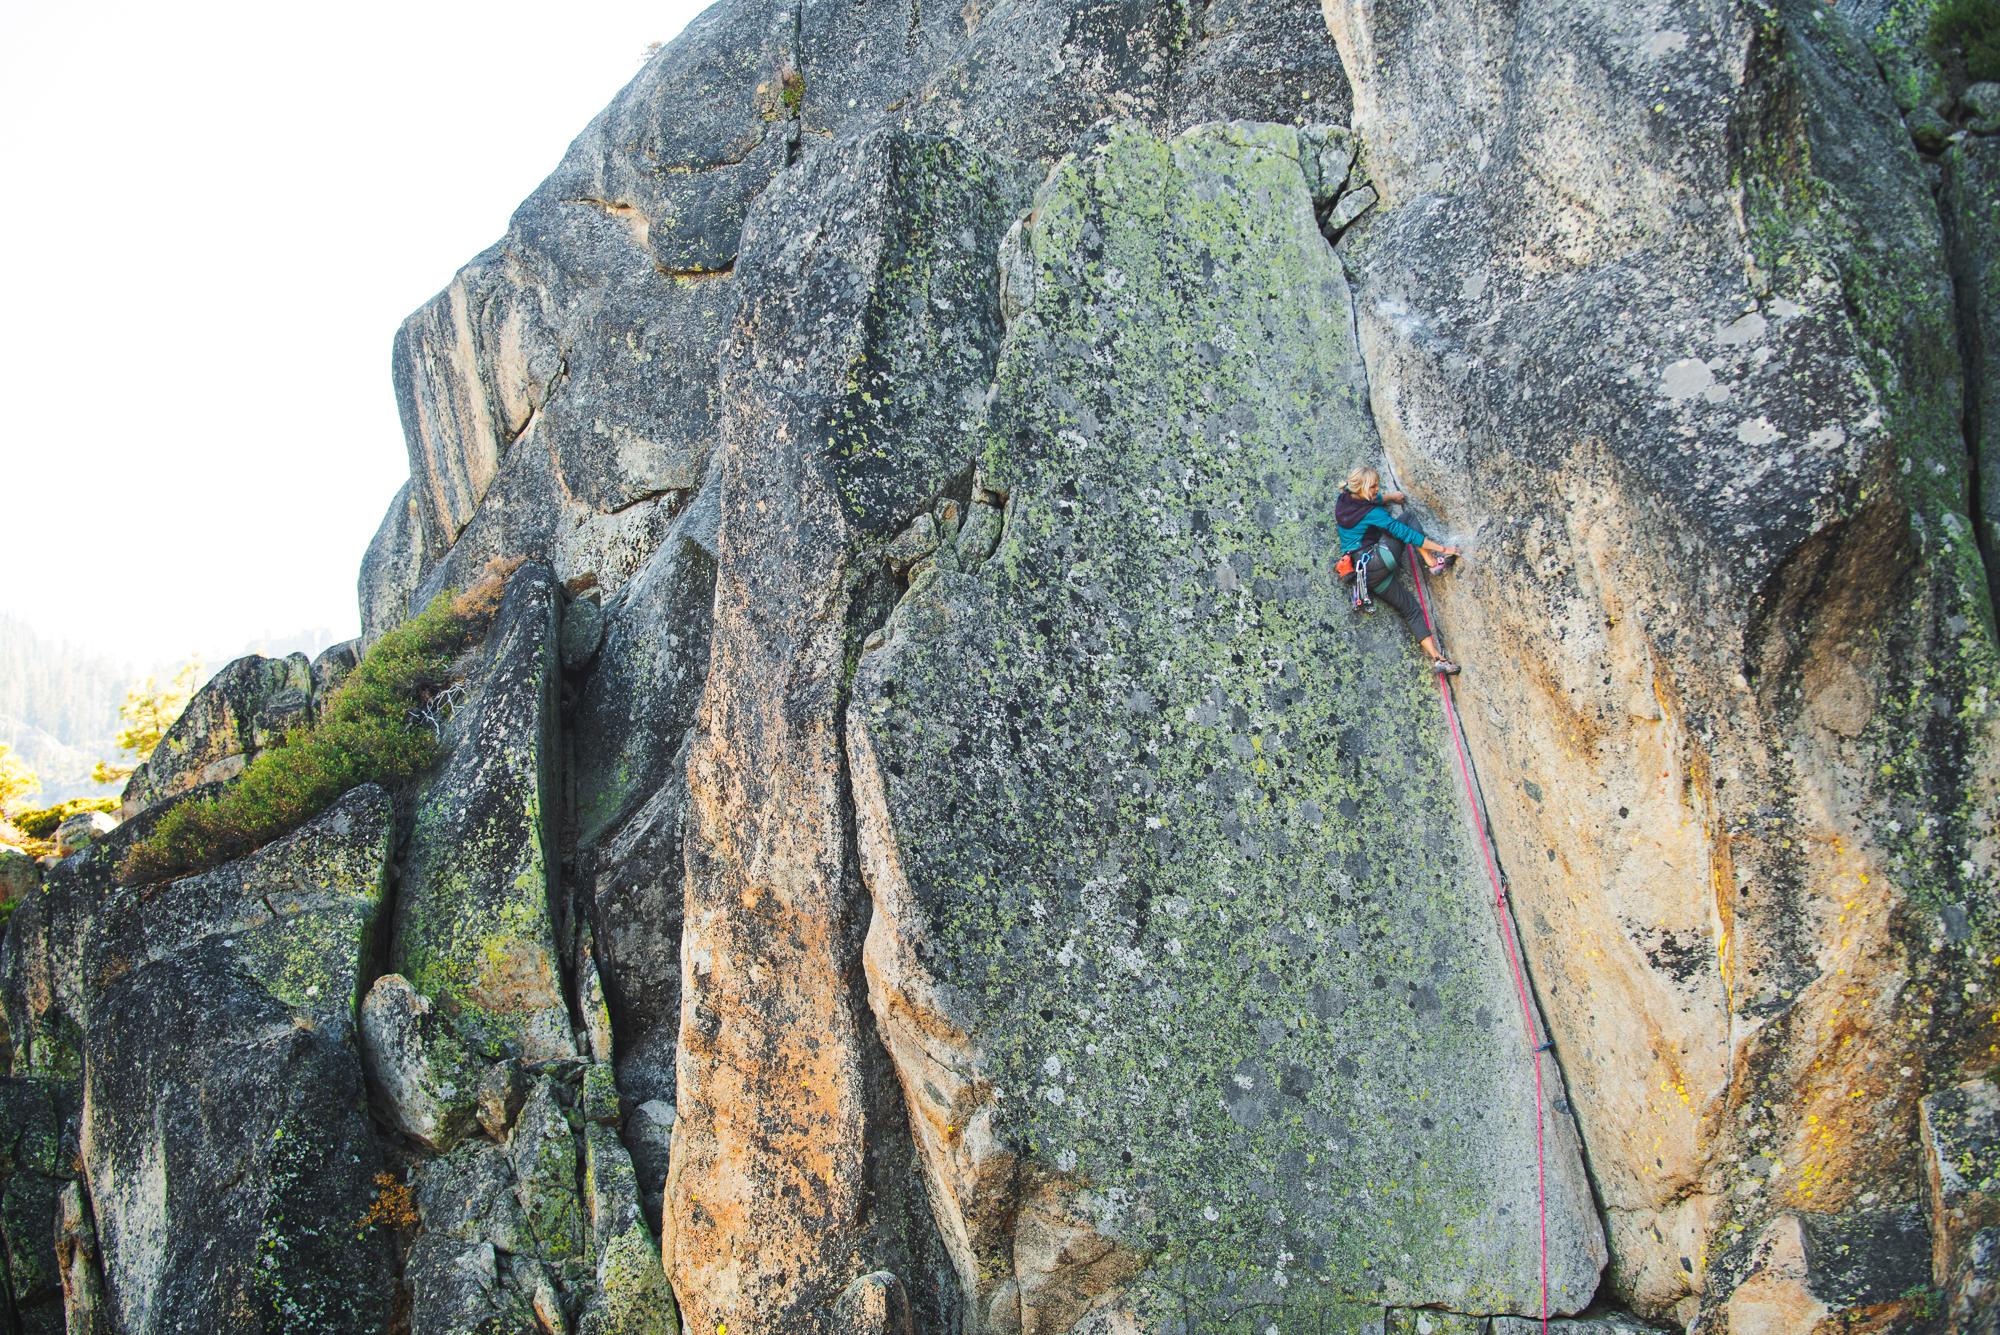 Traditional climbing in Lake Tahoe